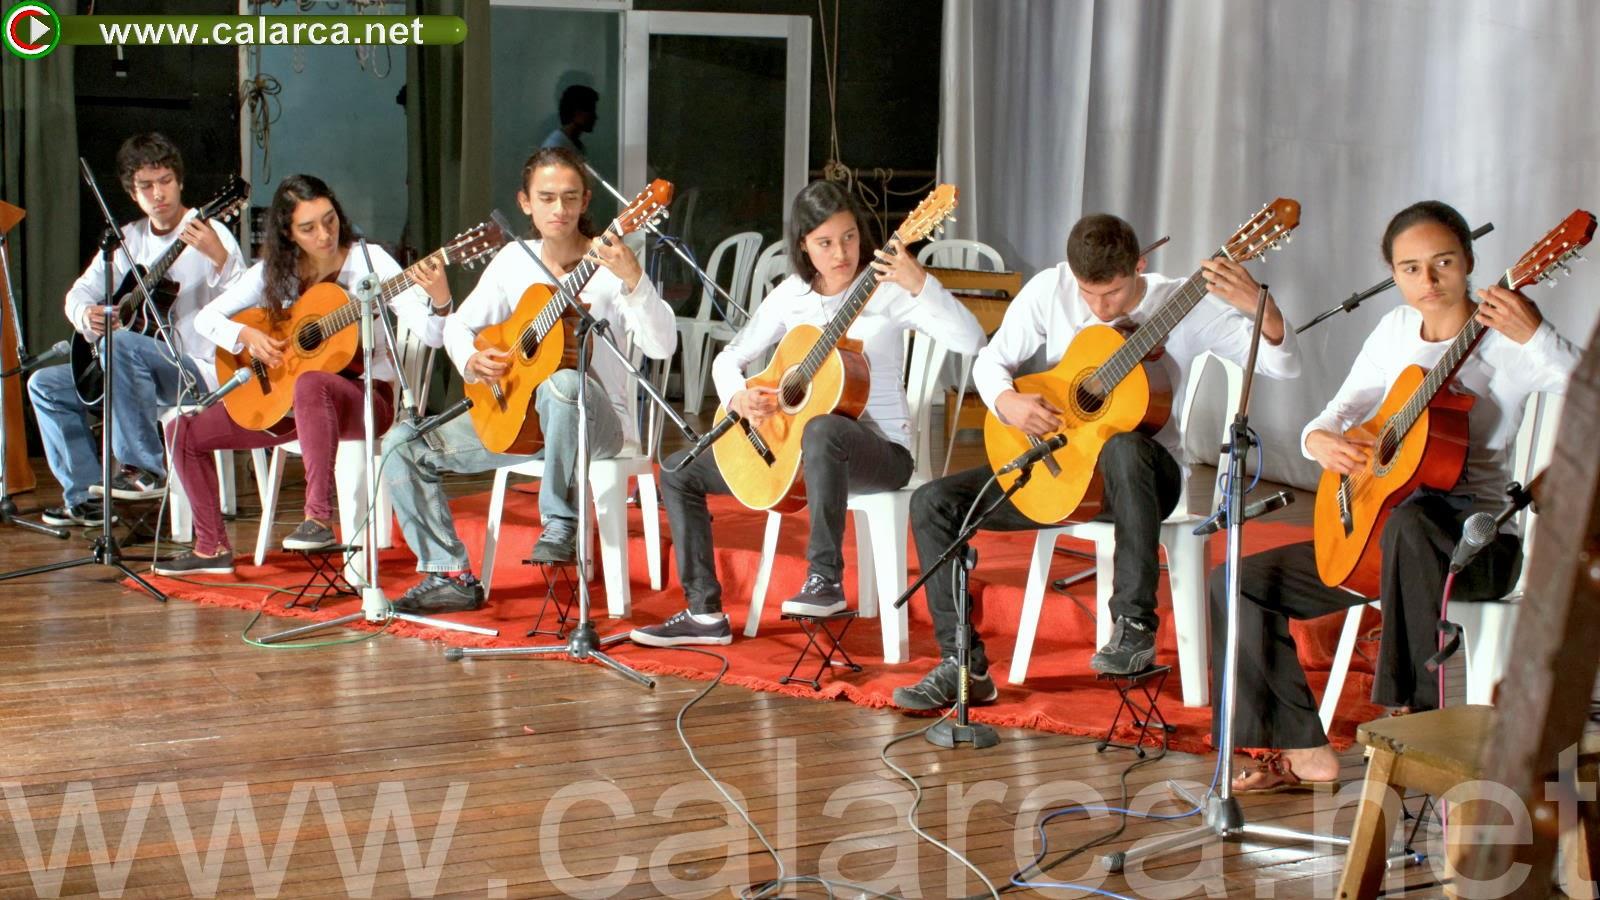 Grupo 6 de guitarra